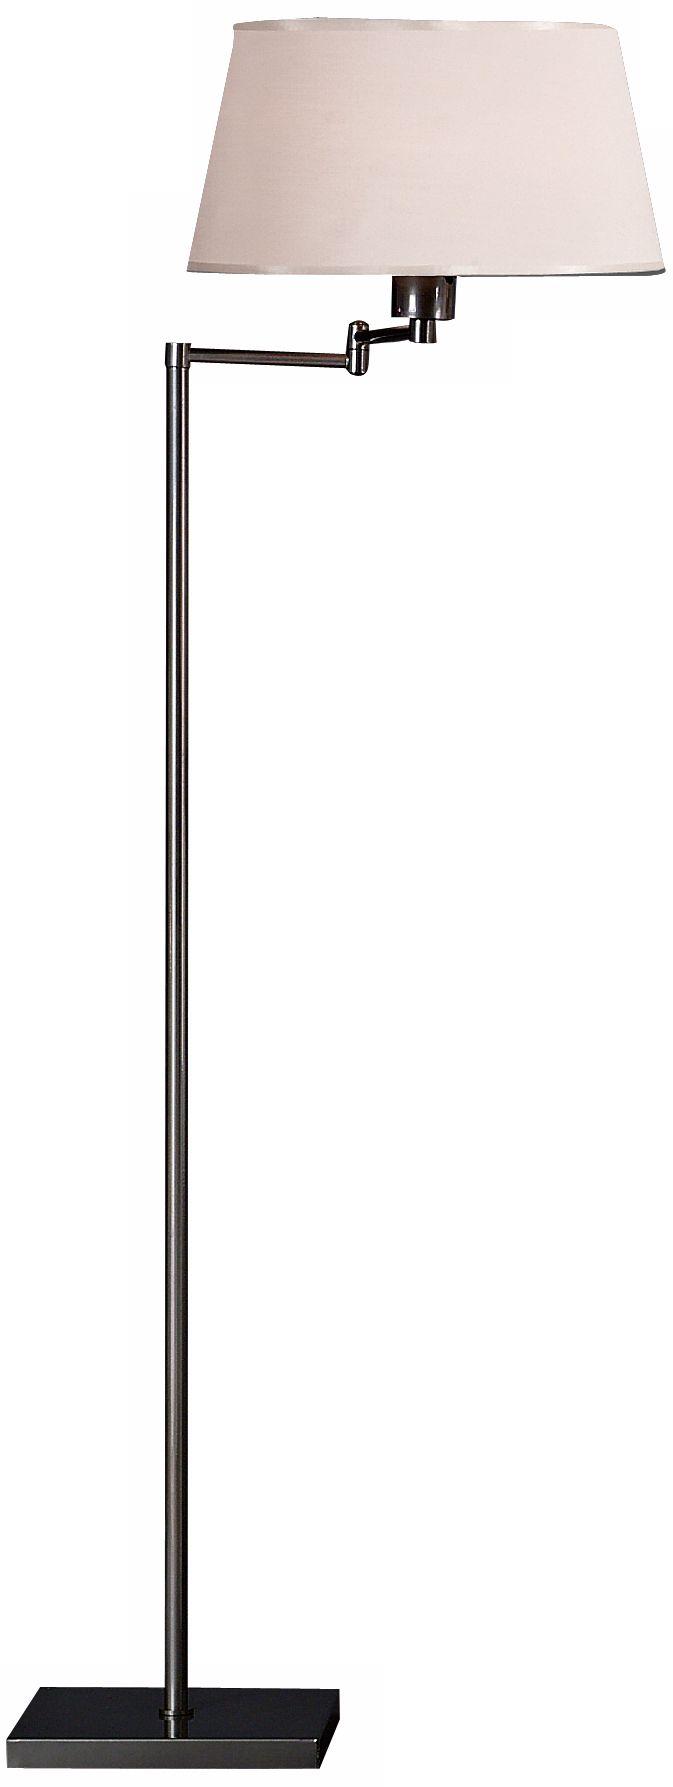 robert abbey real simple gunmetal swing arm floor lamp - Robert Abbey Lighting